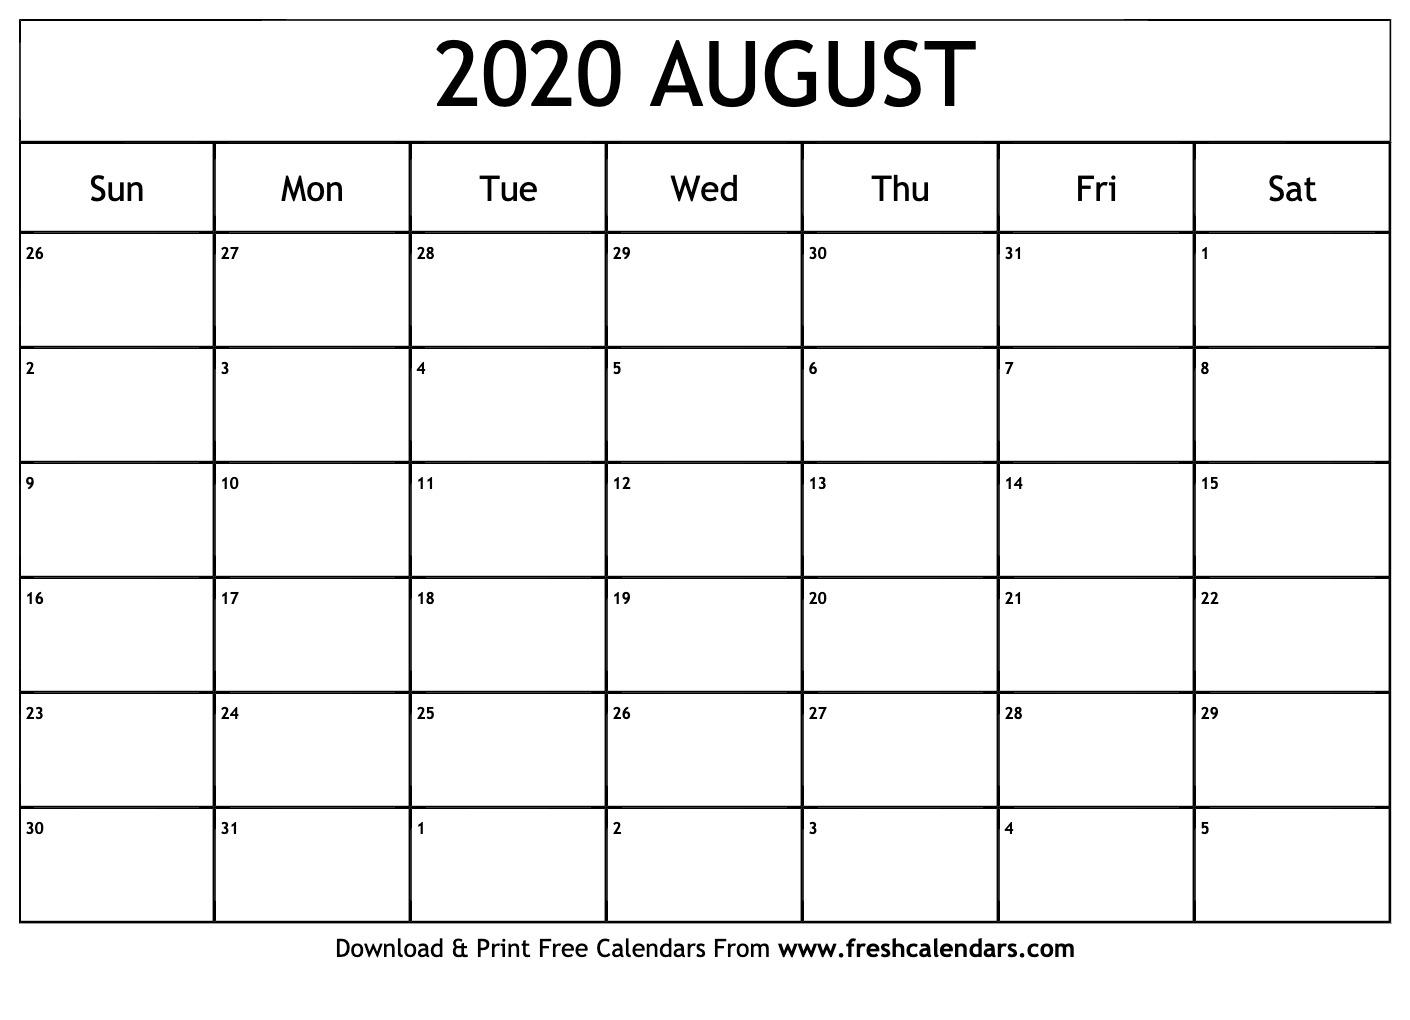 Calendar August 2020 Printable.August 2020 Calendar Printable Fresh Calendars